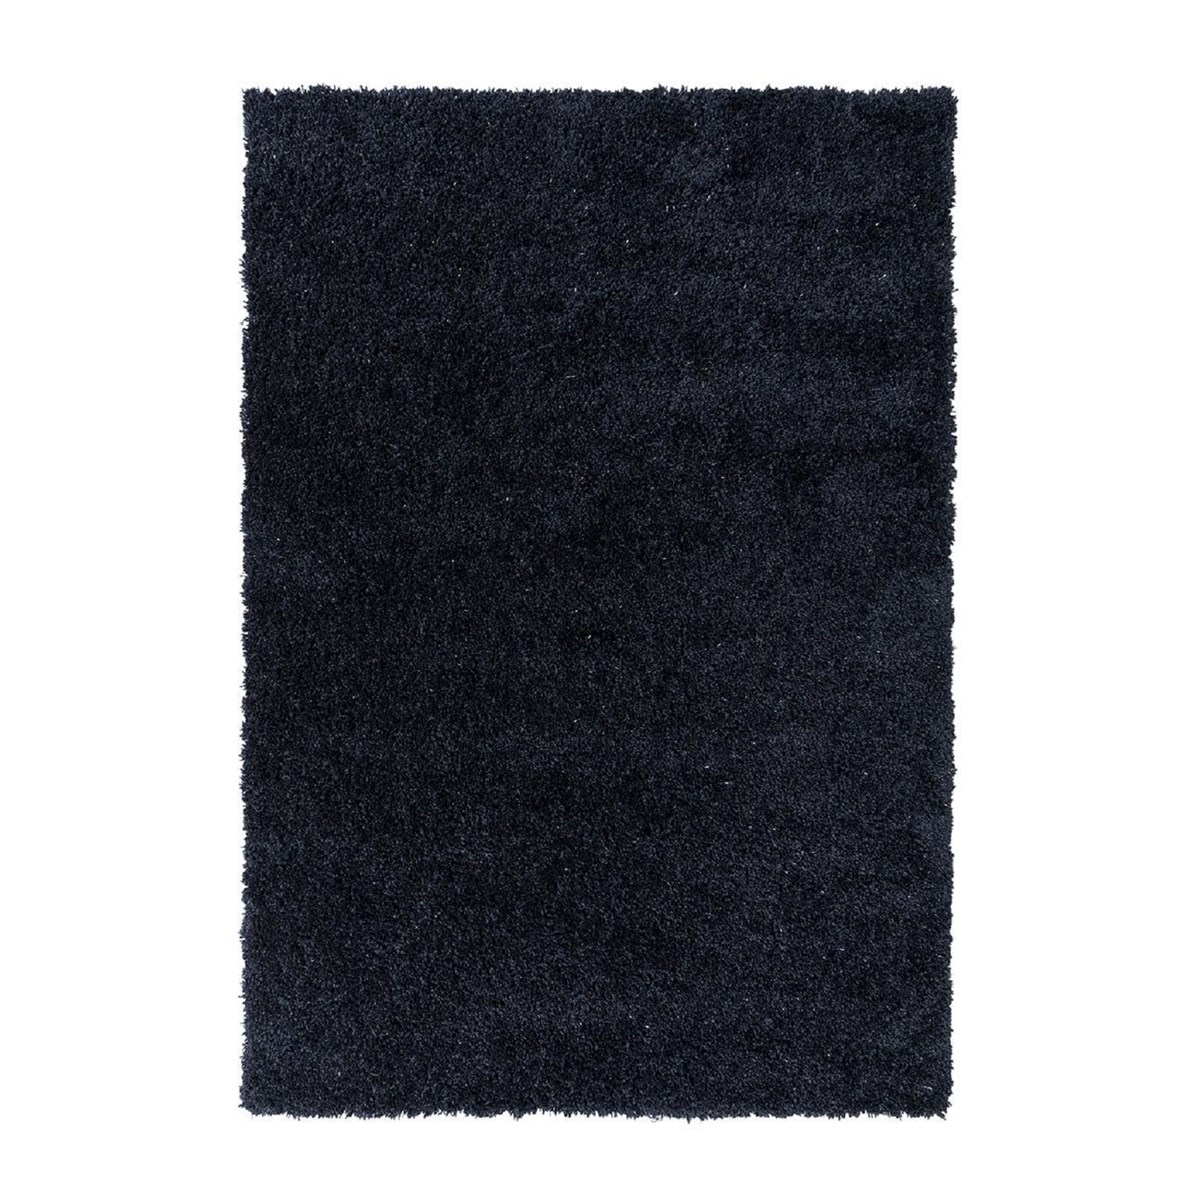 Tapis shaggy en Polyester Bleu nuit 80x160 cm